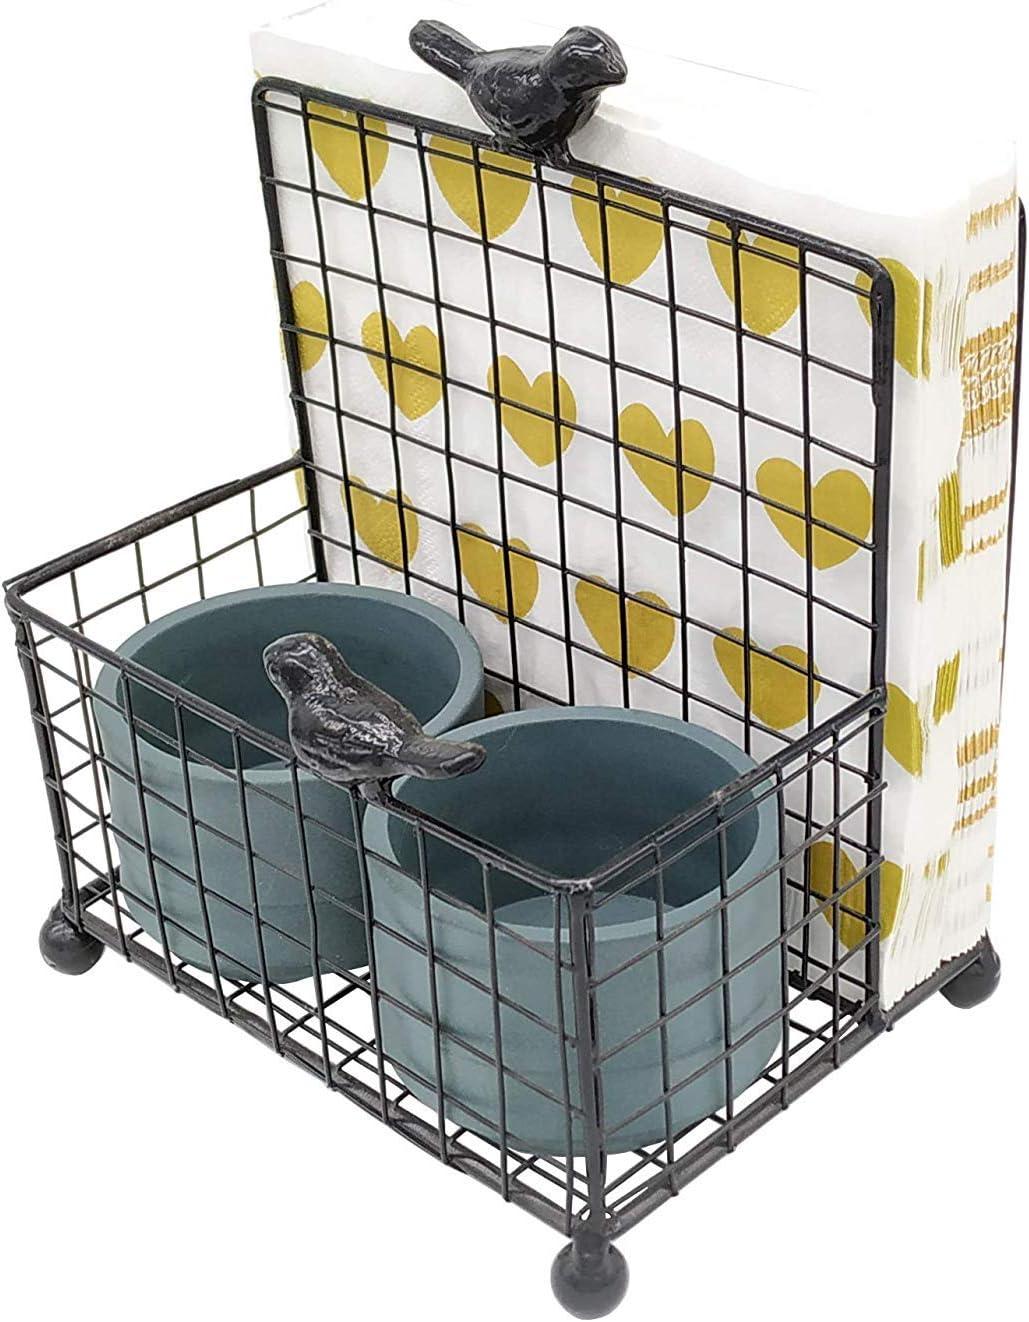 OwlGift Black Salt & Pepper Holder and Napkin Holder, Condiments Storage Organizer for Kitchen Countertops and Dinning Table, Black